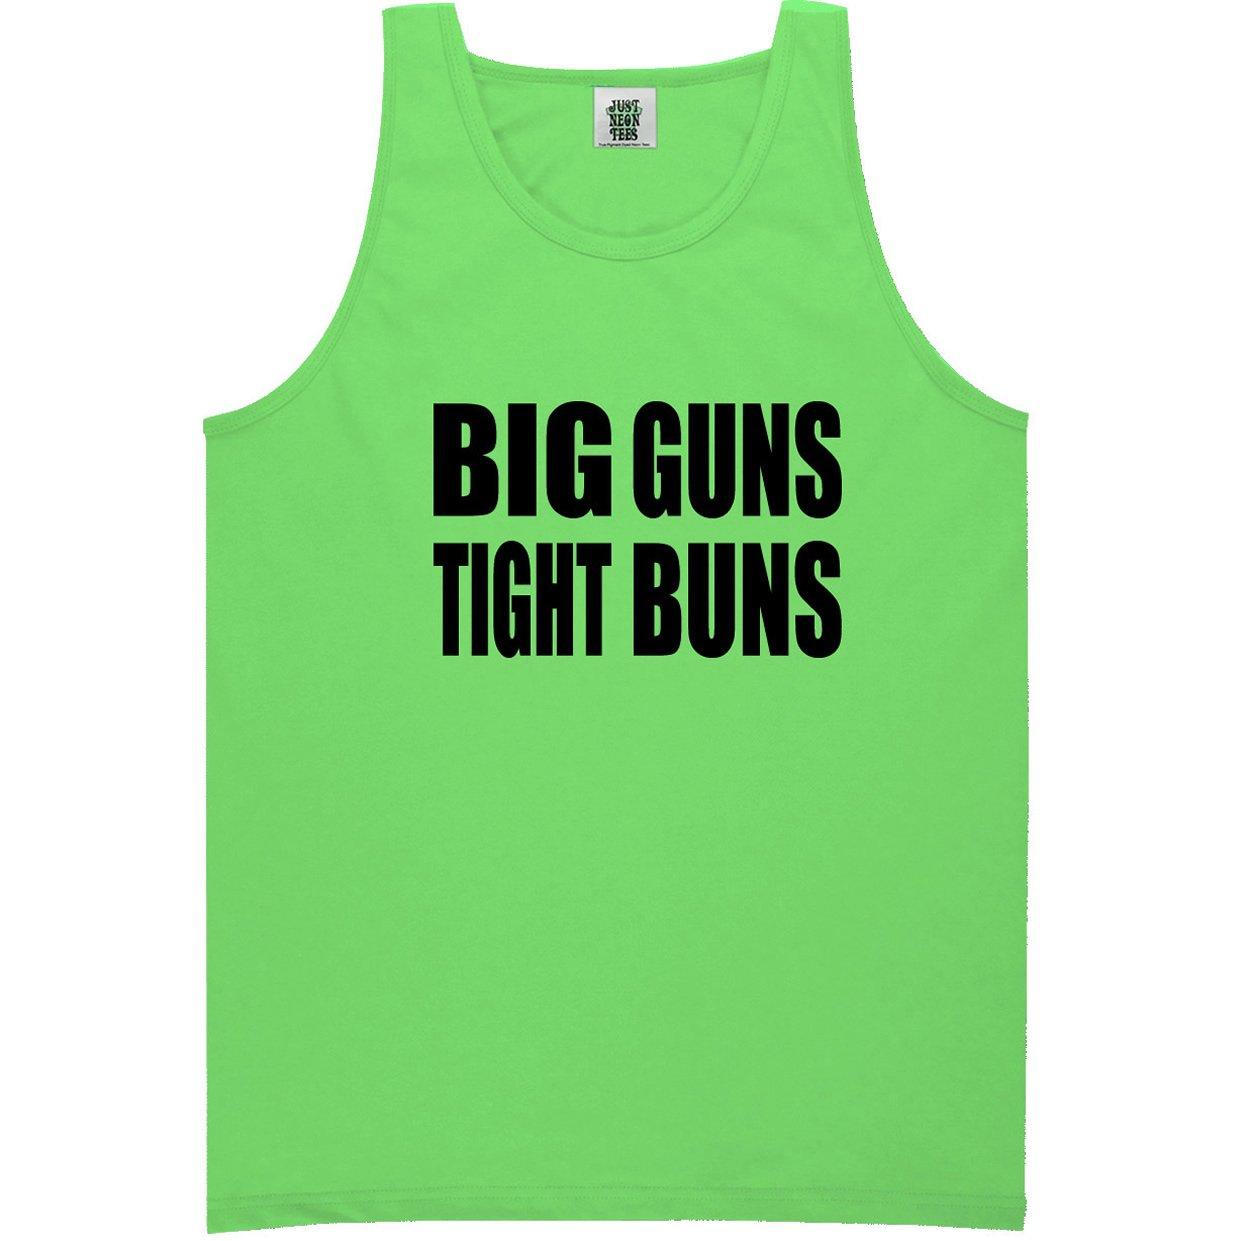 ZeroGravitee Big Guns Tight Buns Bright Neon Tank Top